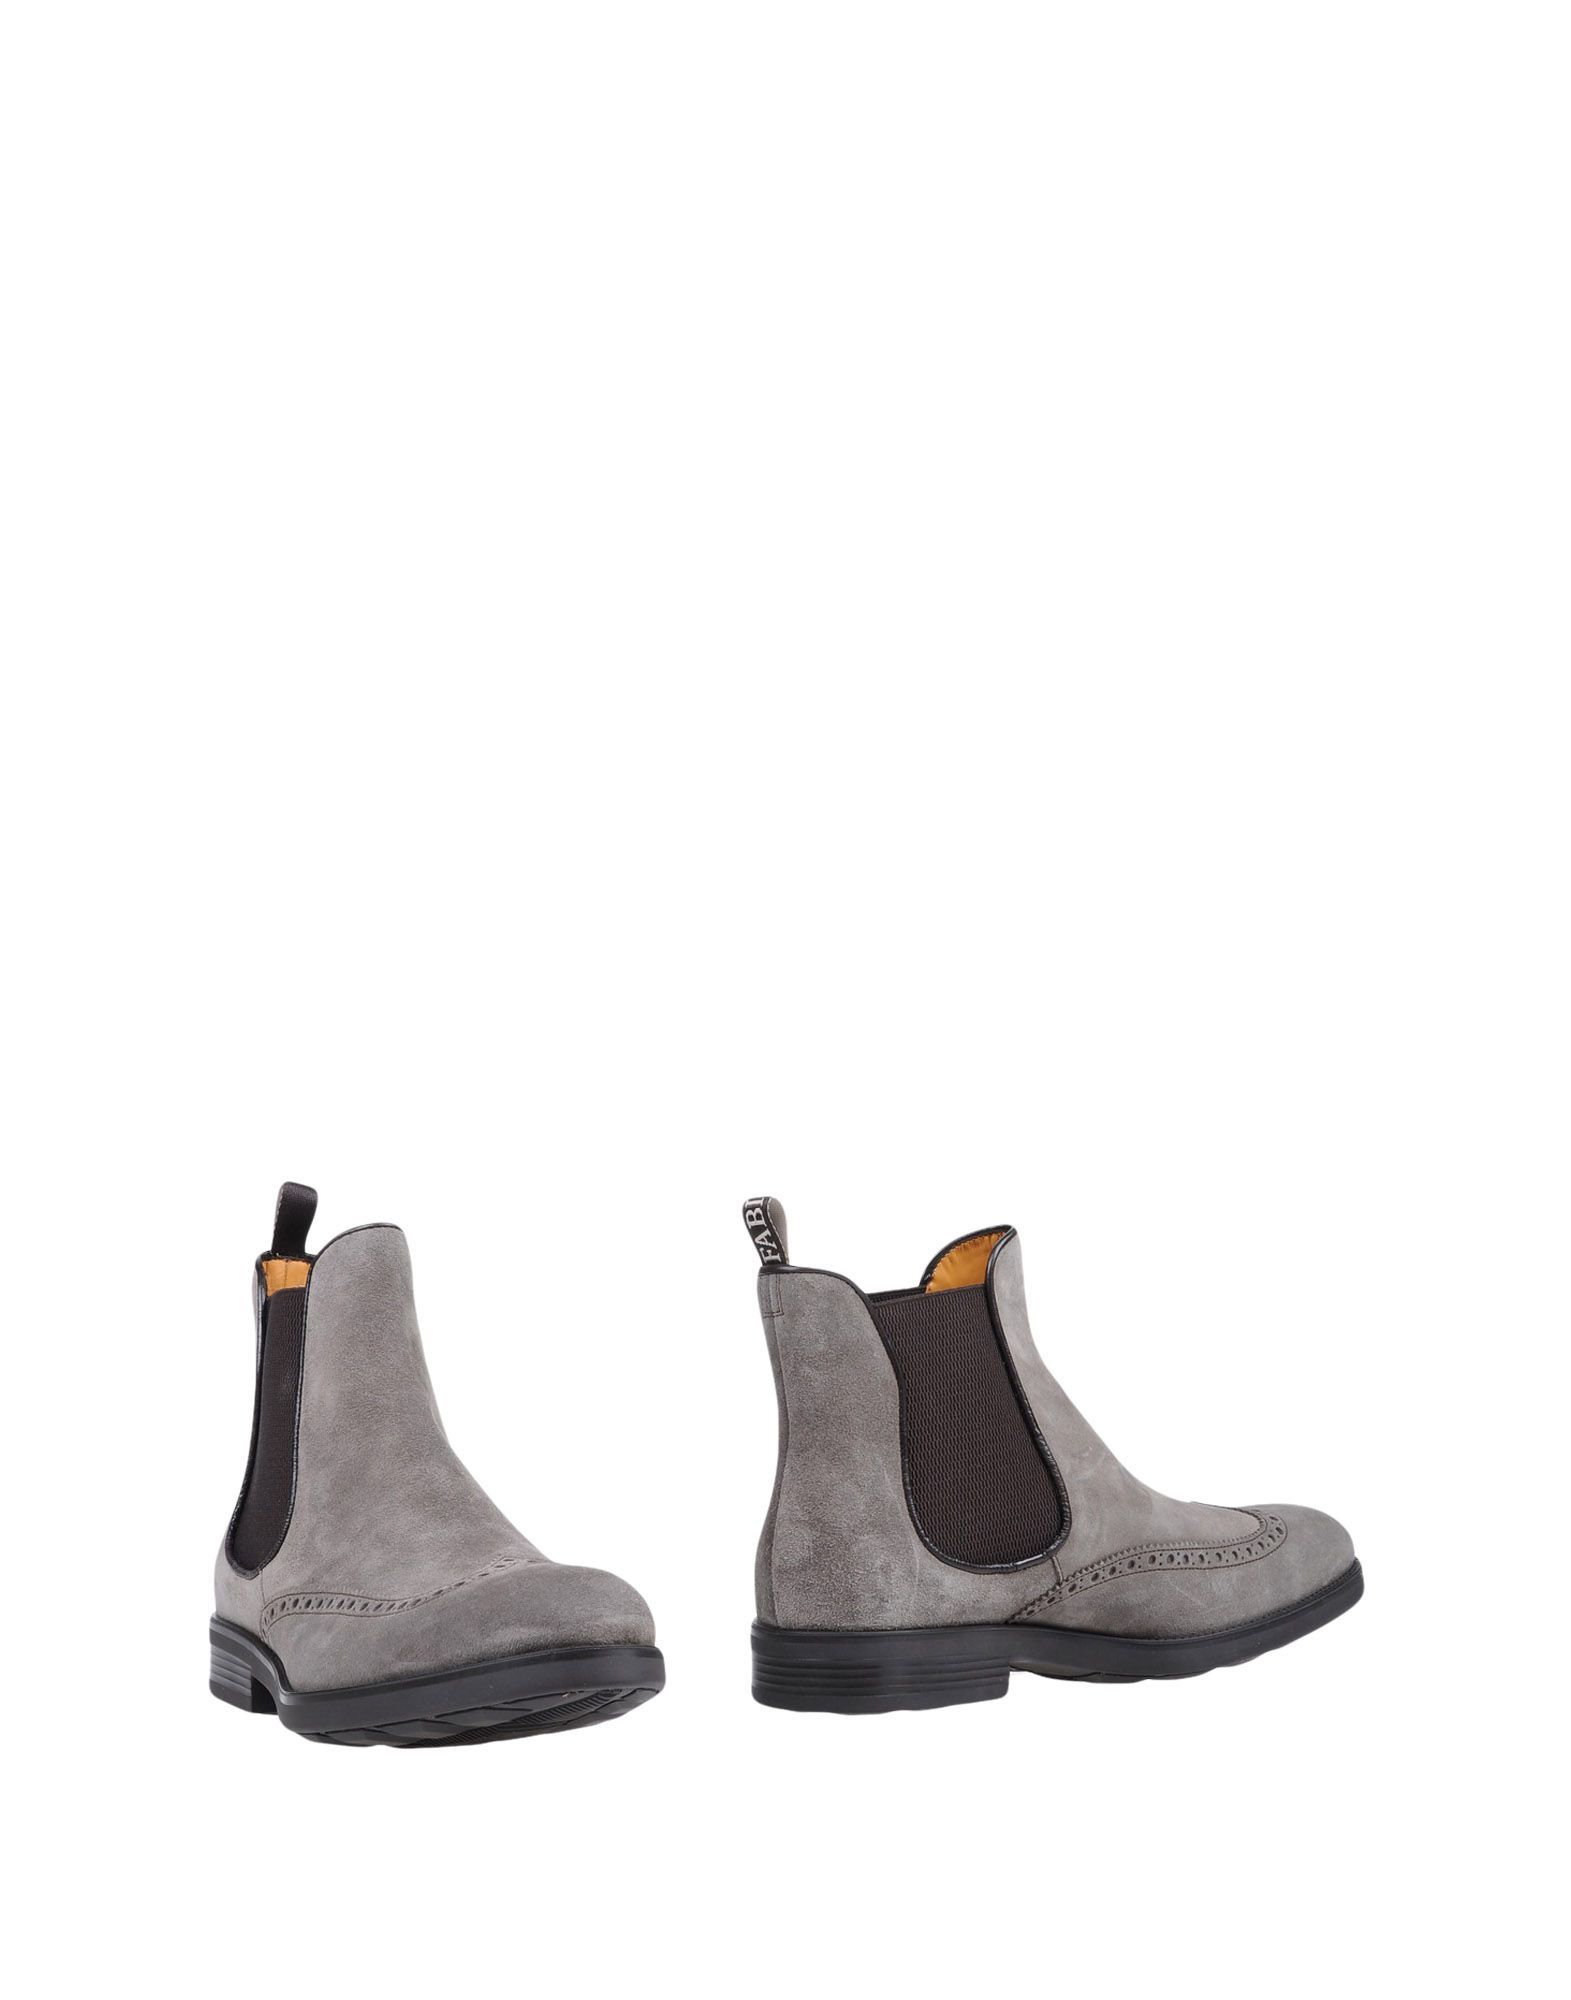 Fabi Lead Leather Chelsea Boots